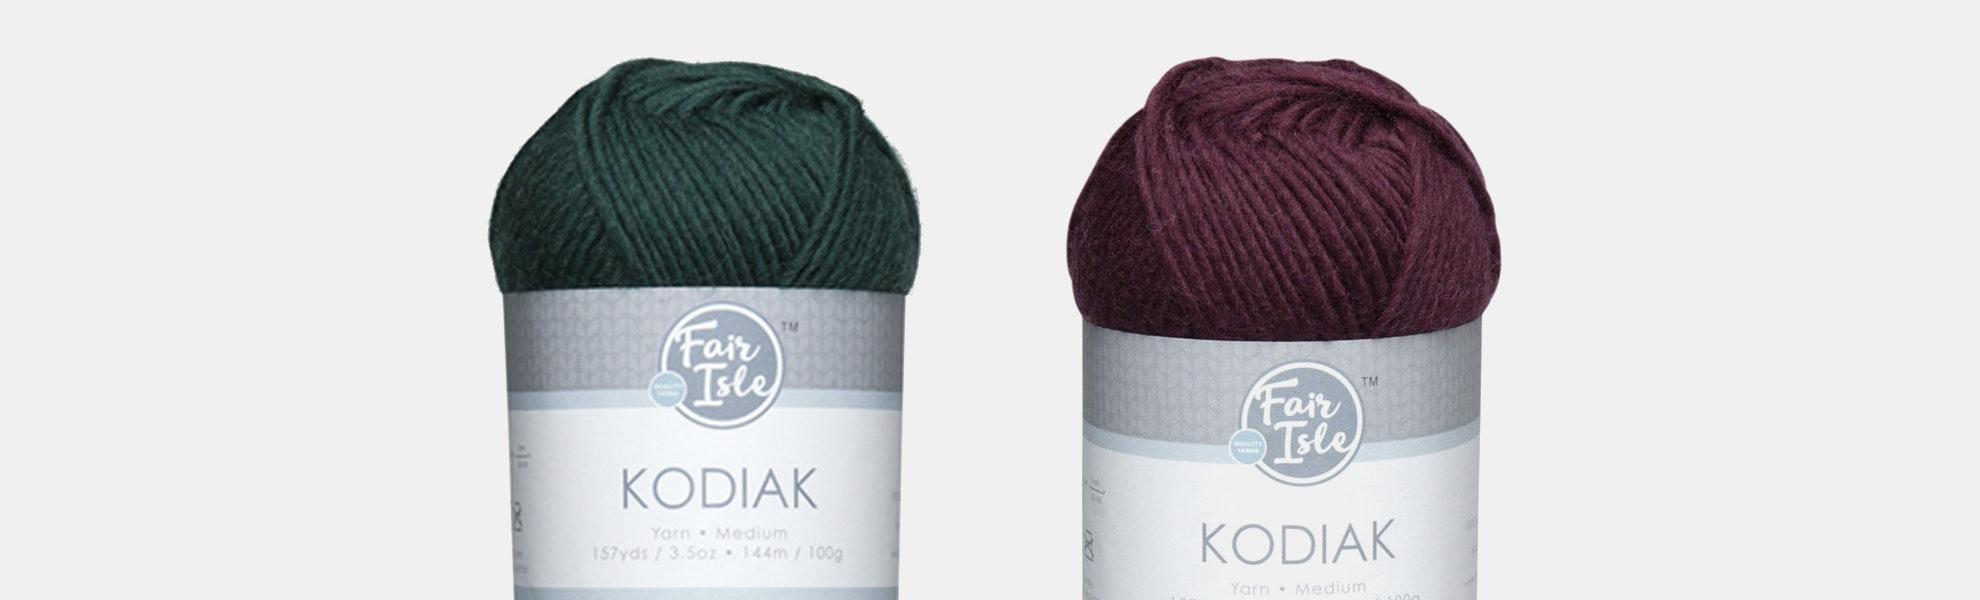 Kodiak Brights Yarn by Fair Isle (2-Pack) | Price & Reviews | Massdrop